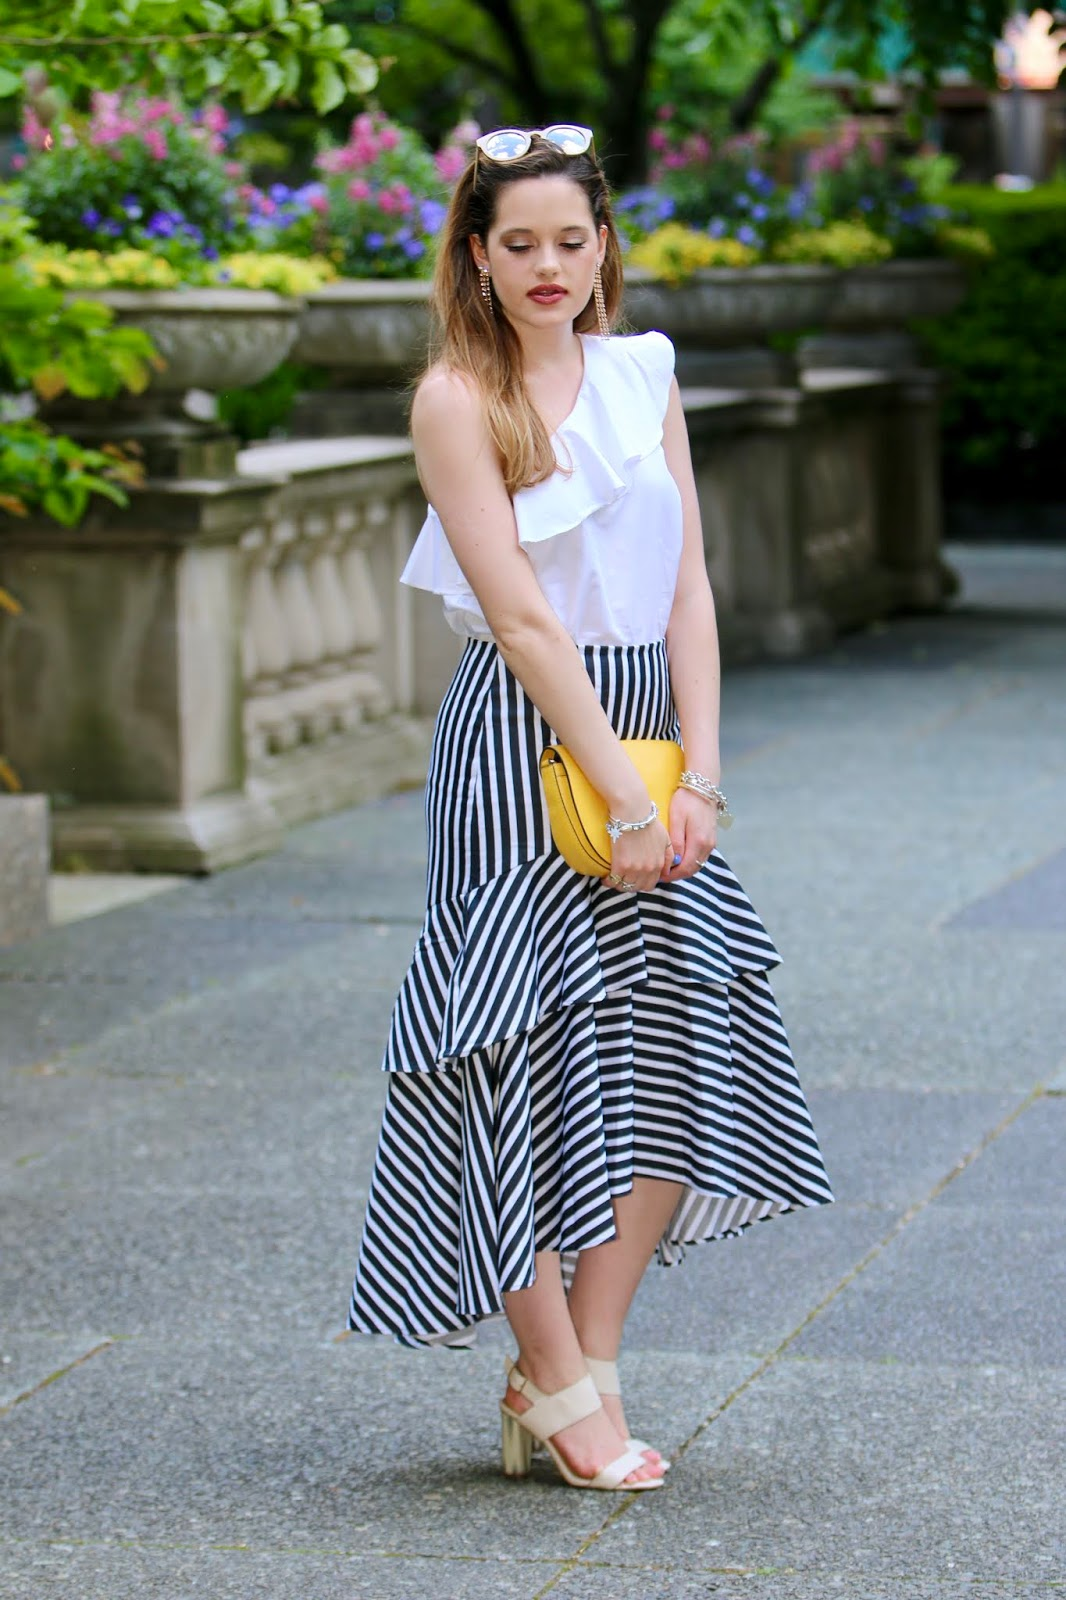 Nyc fashion blogger Kathleen Harper's Chicago summer street style